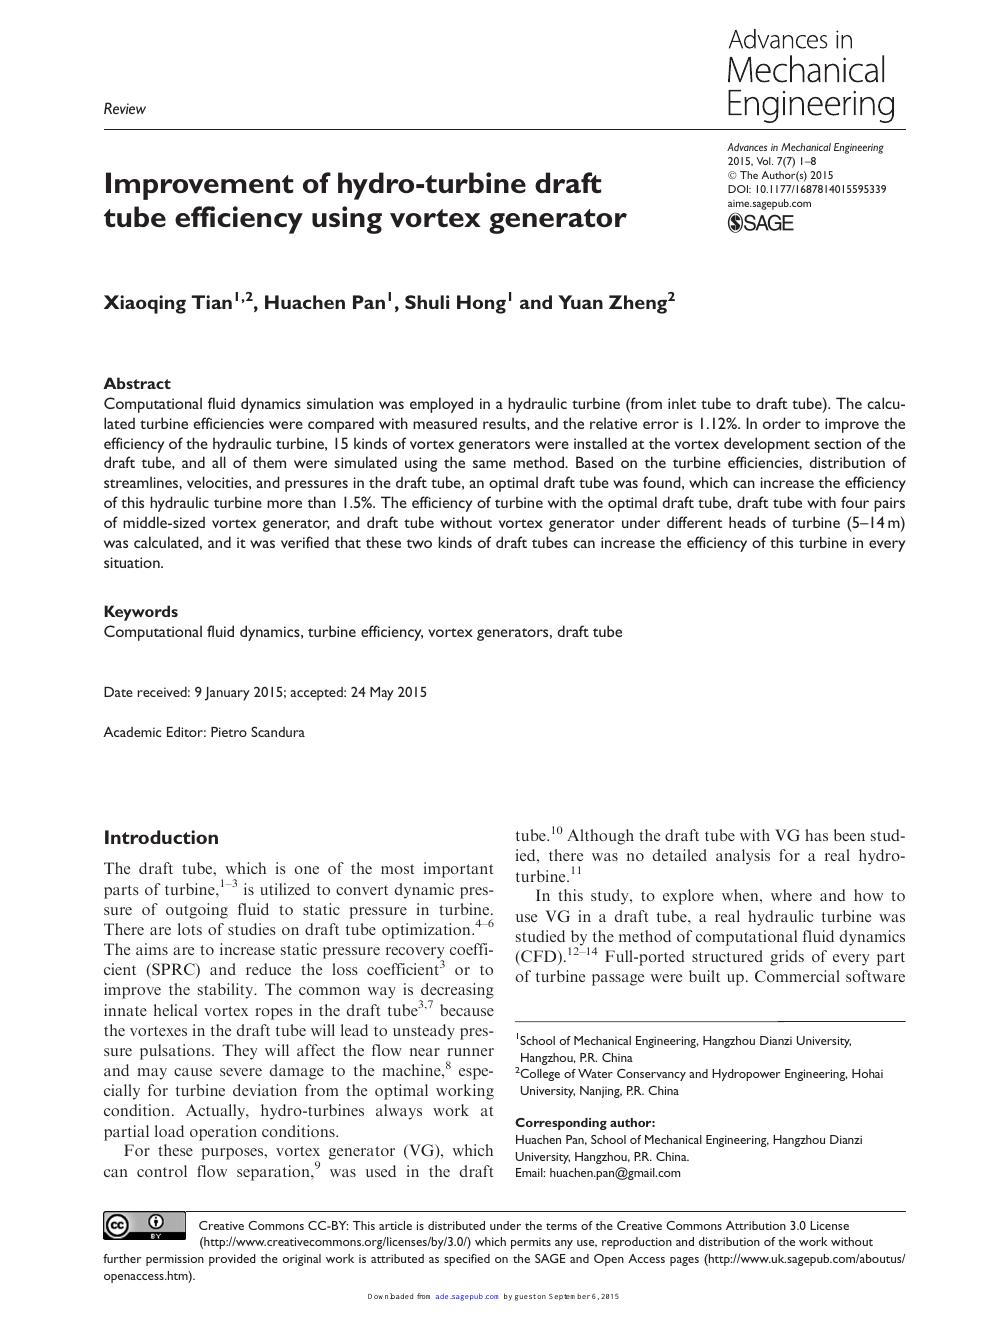 Improvement of hydro-turbine draft tube efficiency using